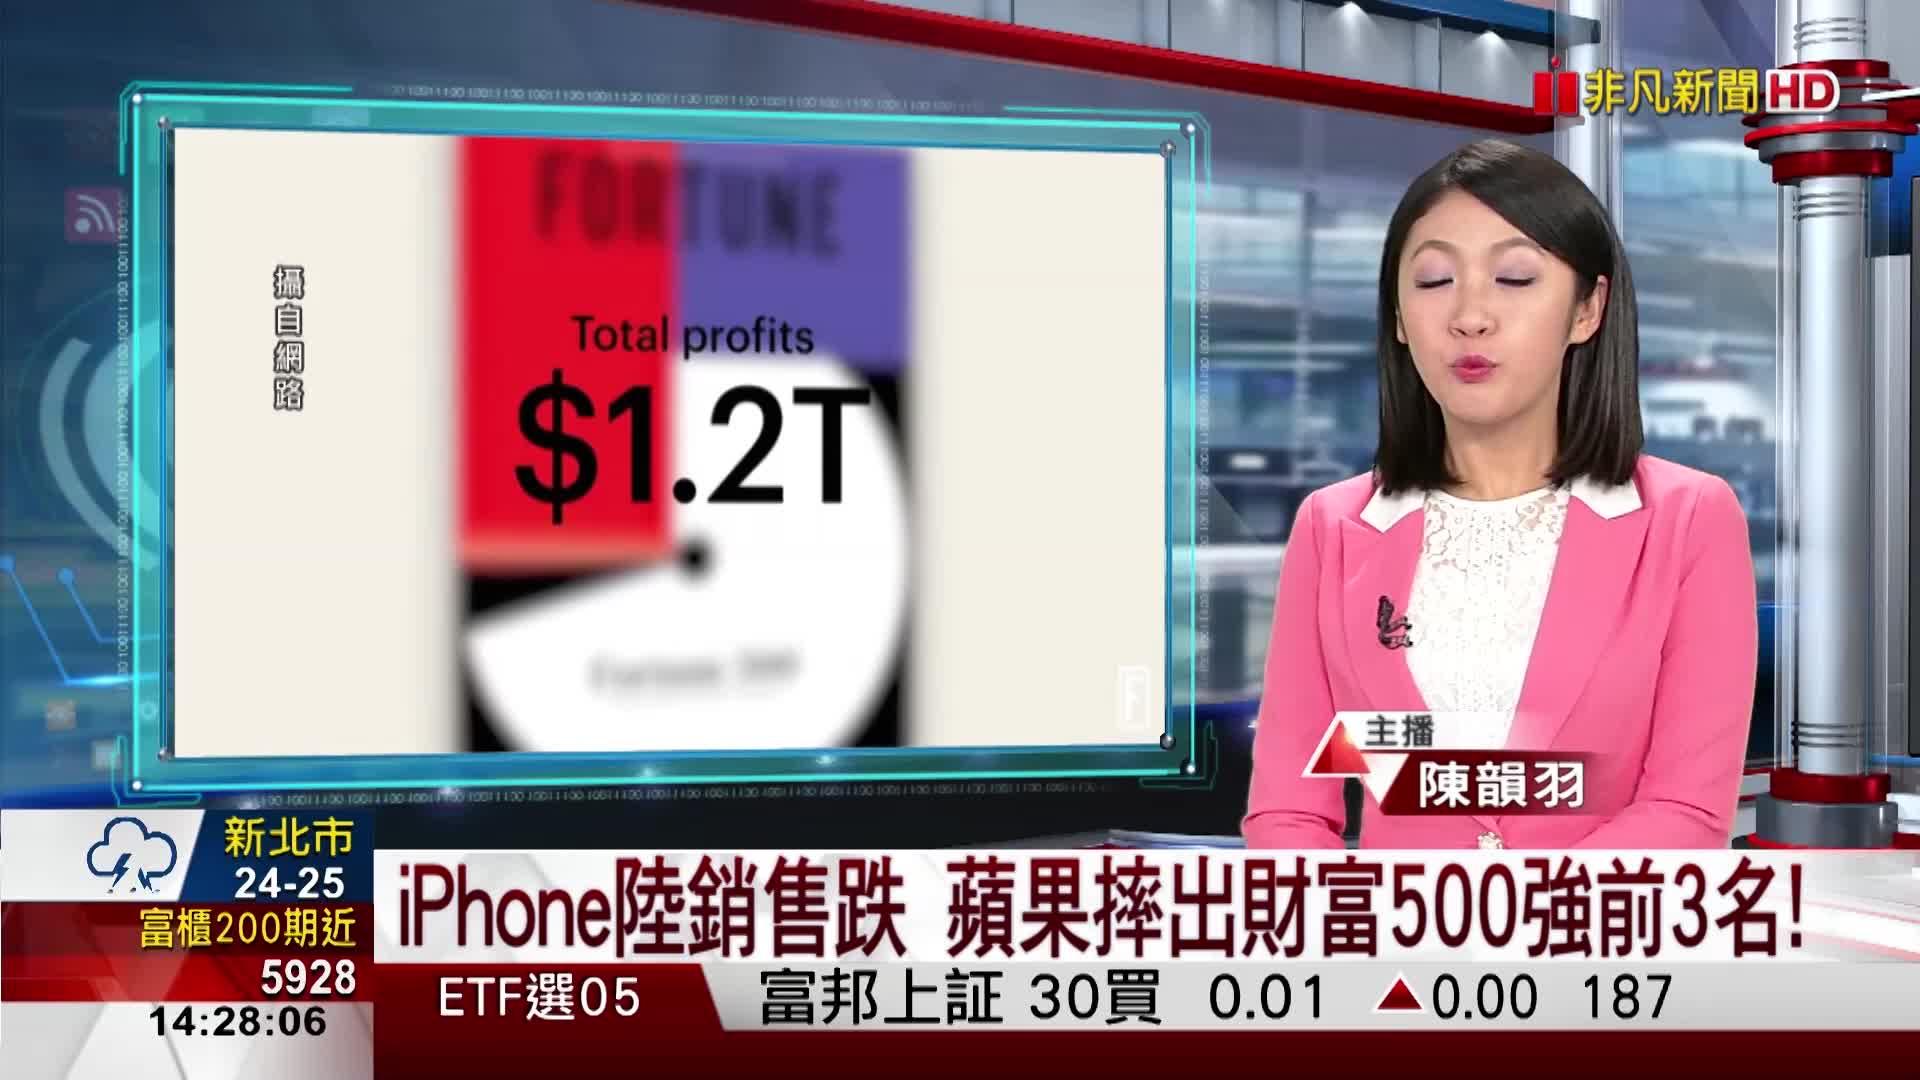 iPhone陸銷售跌 蘋果摔出財富500強前3名!